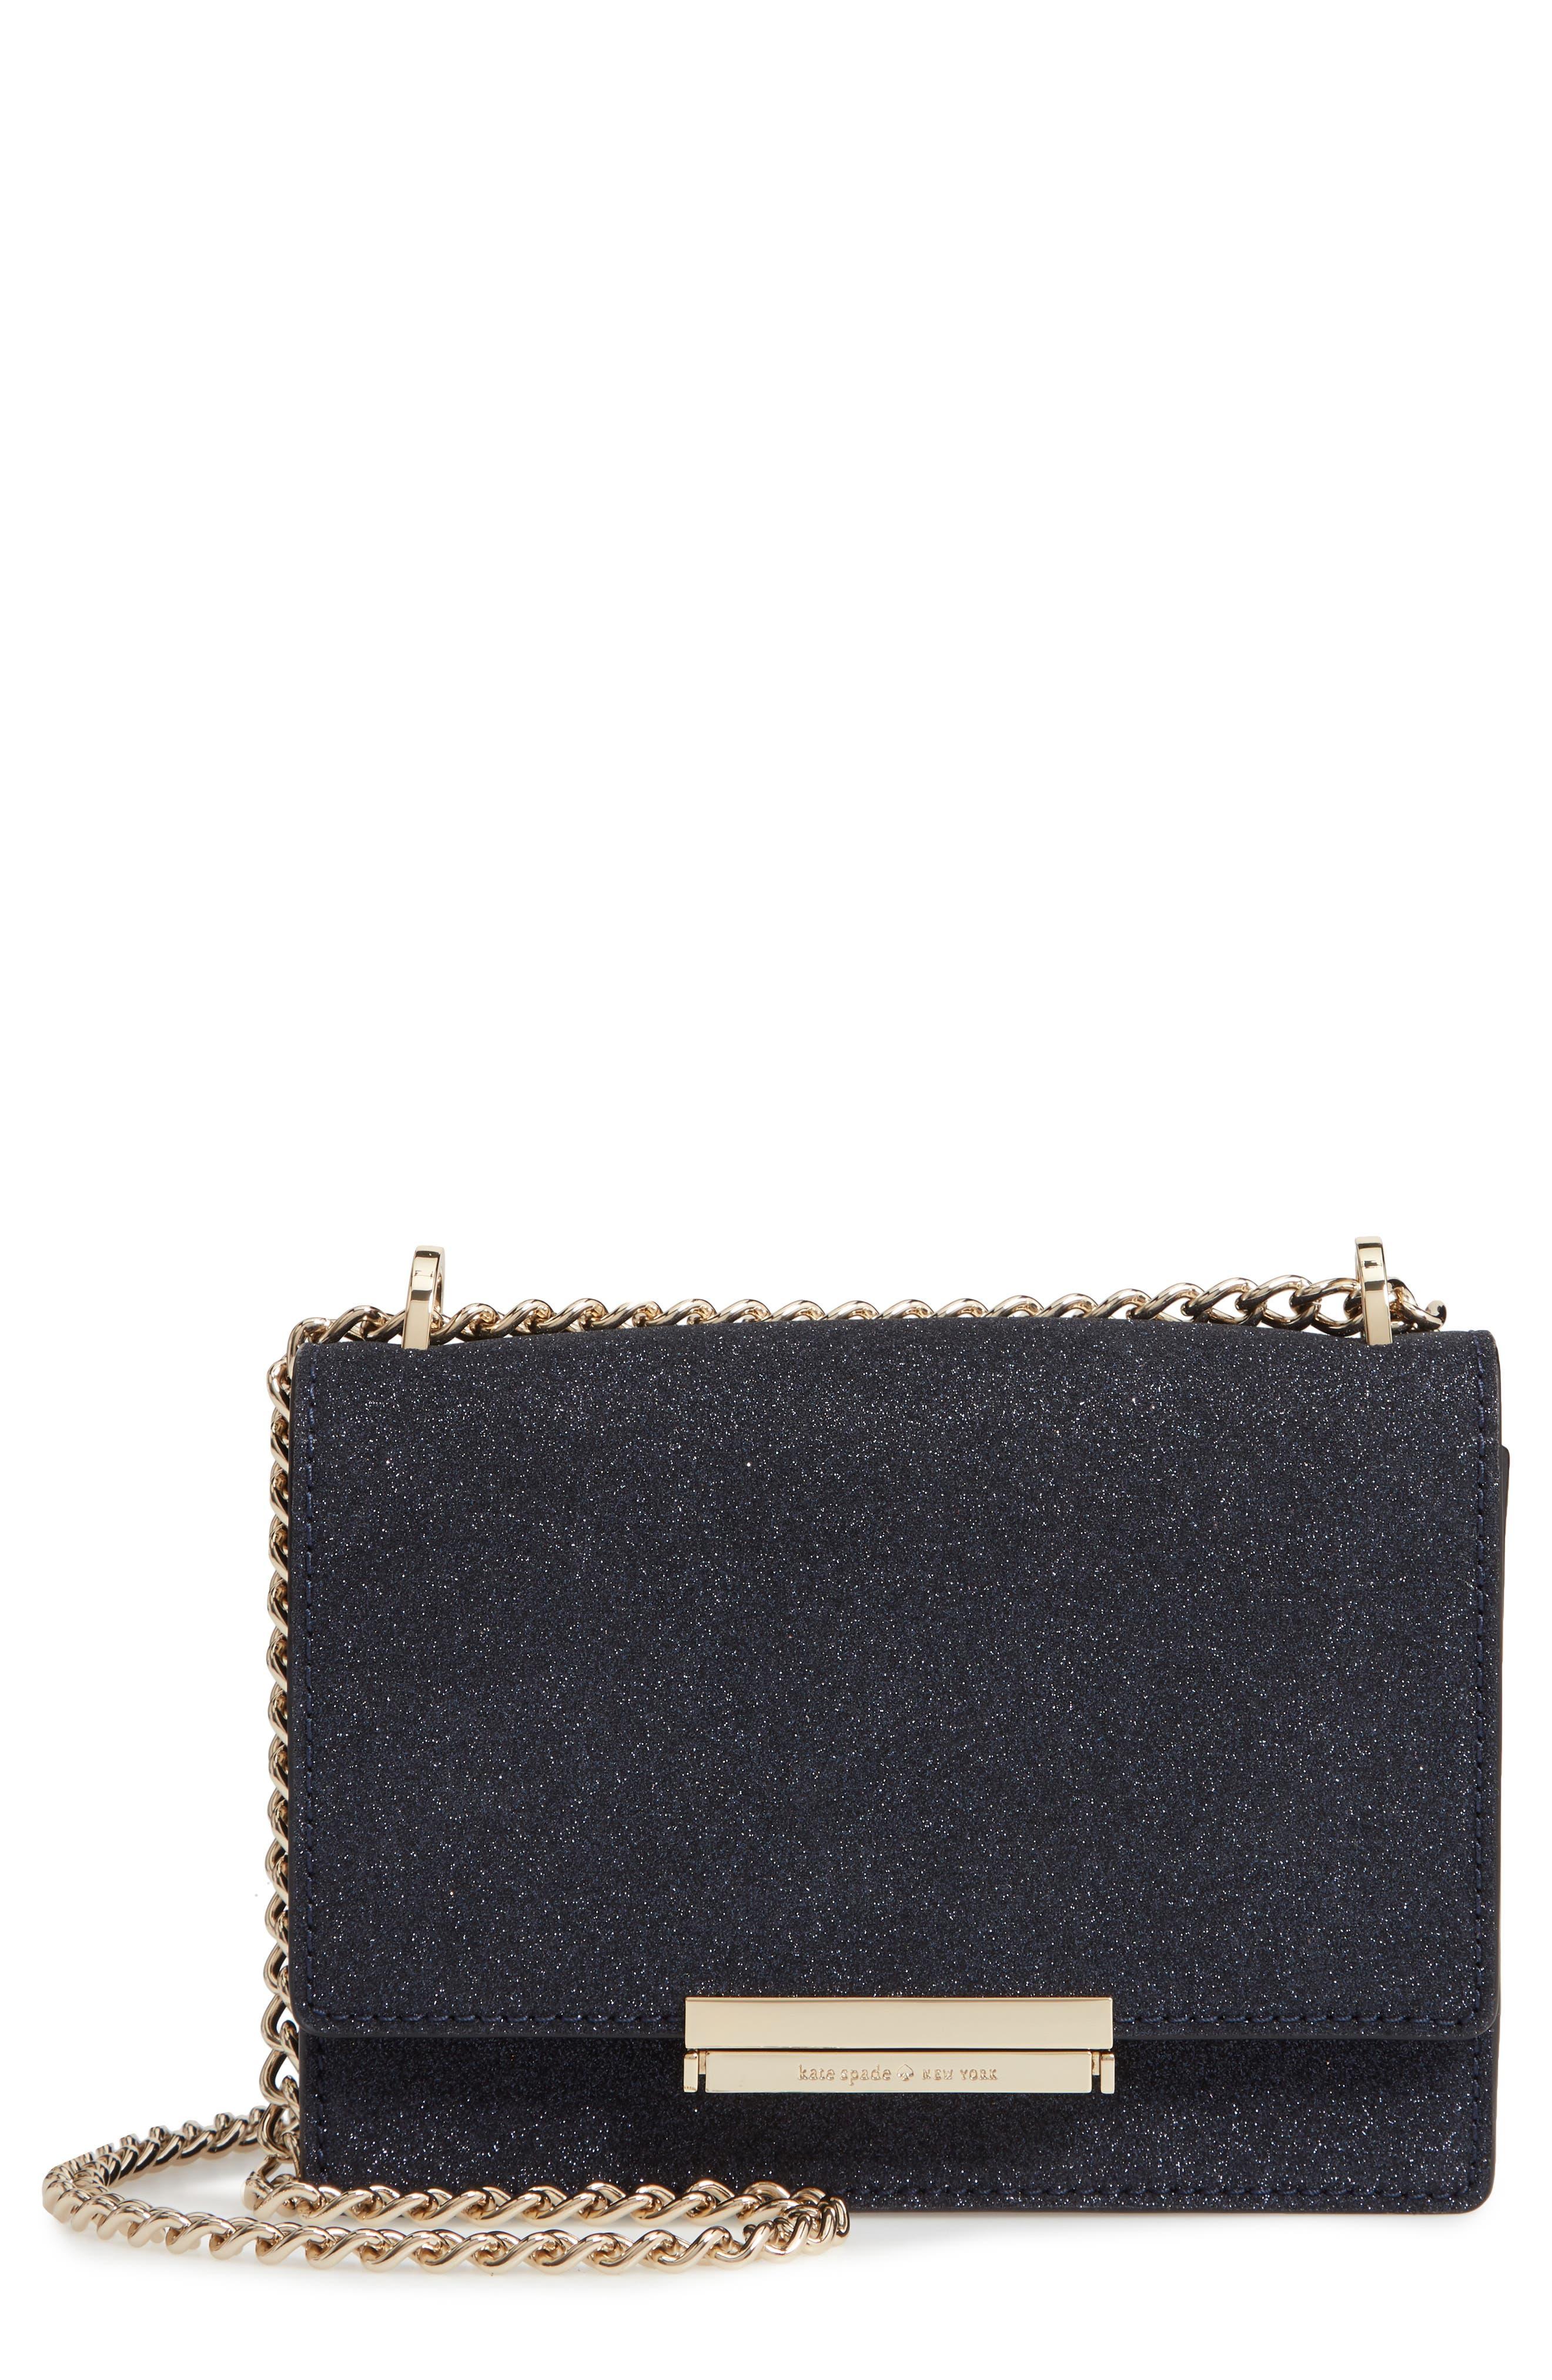 burgess court - hazel glitter crossbody bag,                             Main thumbnail 1, color,                             400